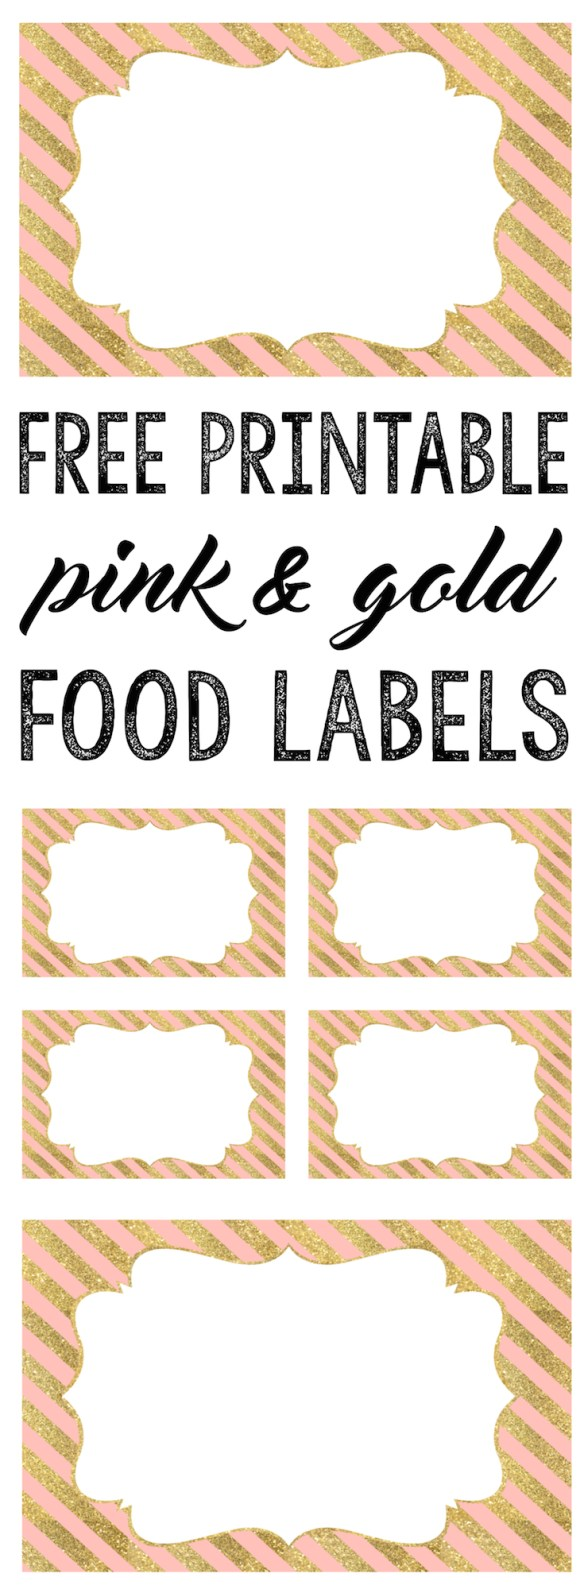 Free Printable Food Labels For Bridal Shower